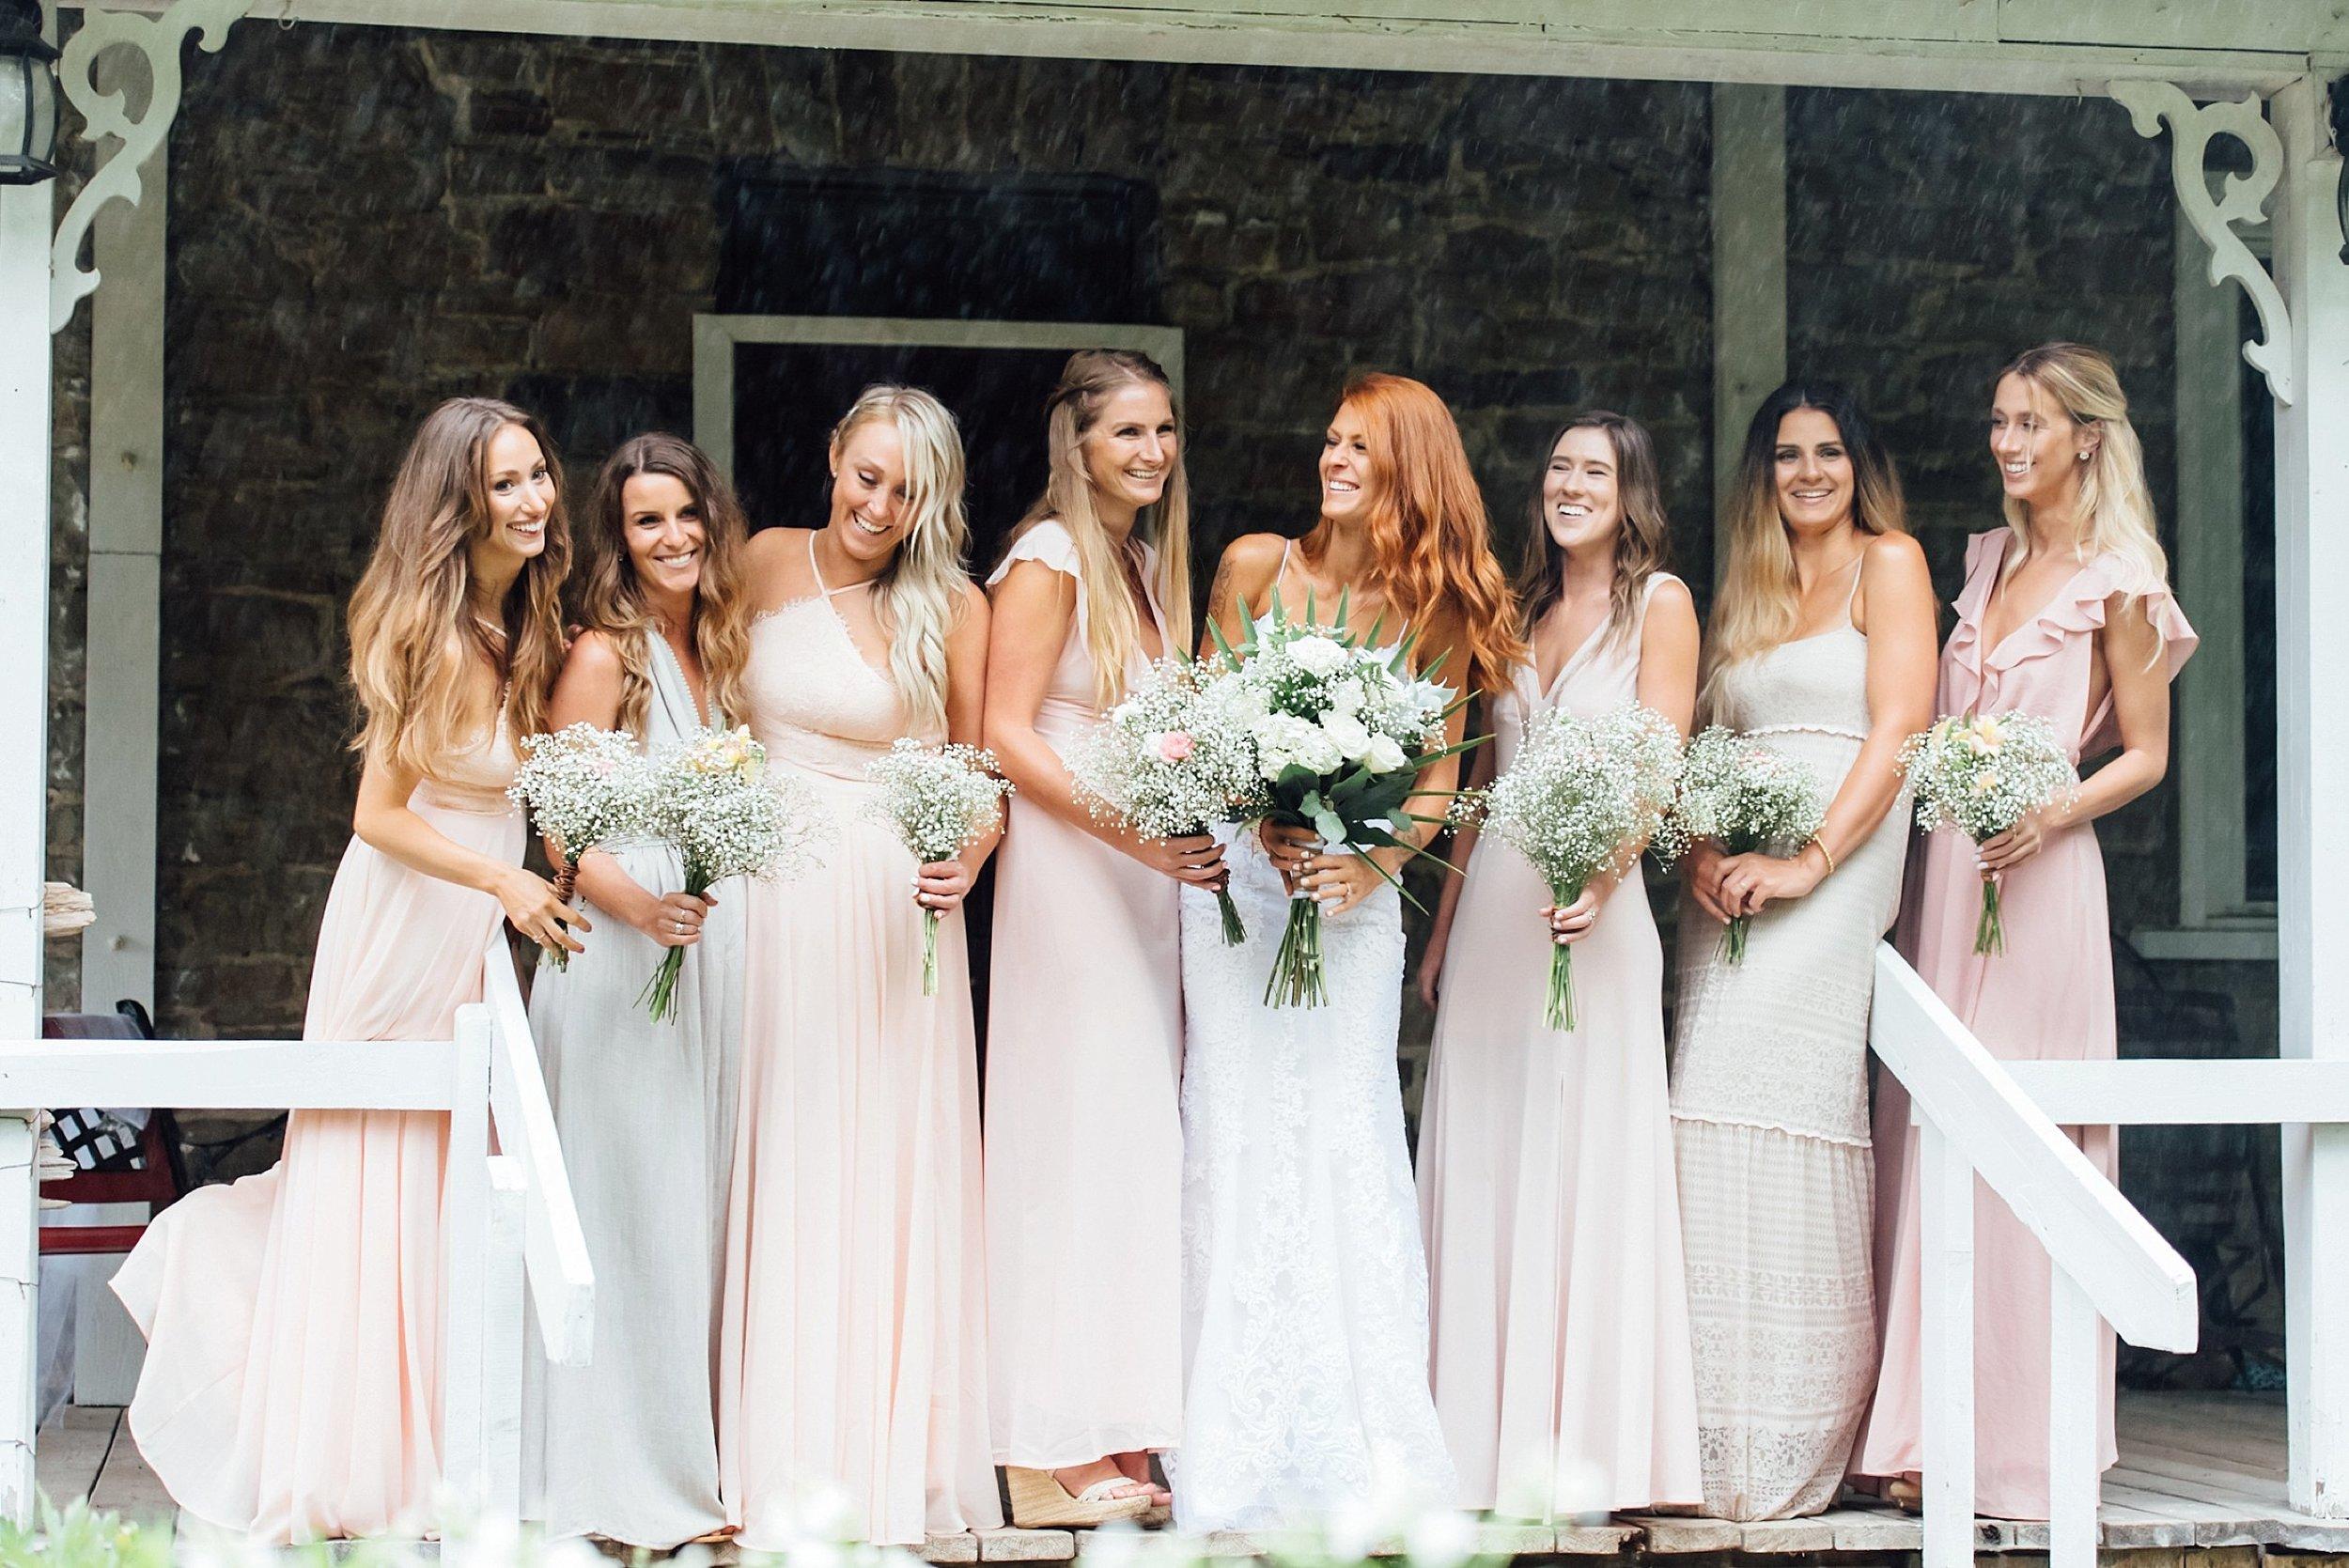 Ottawa Wedding Photographer - Stanley's Olde Maple Lane Barn Wedding - Ali & Batoul Photography_0042.jpg